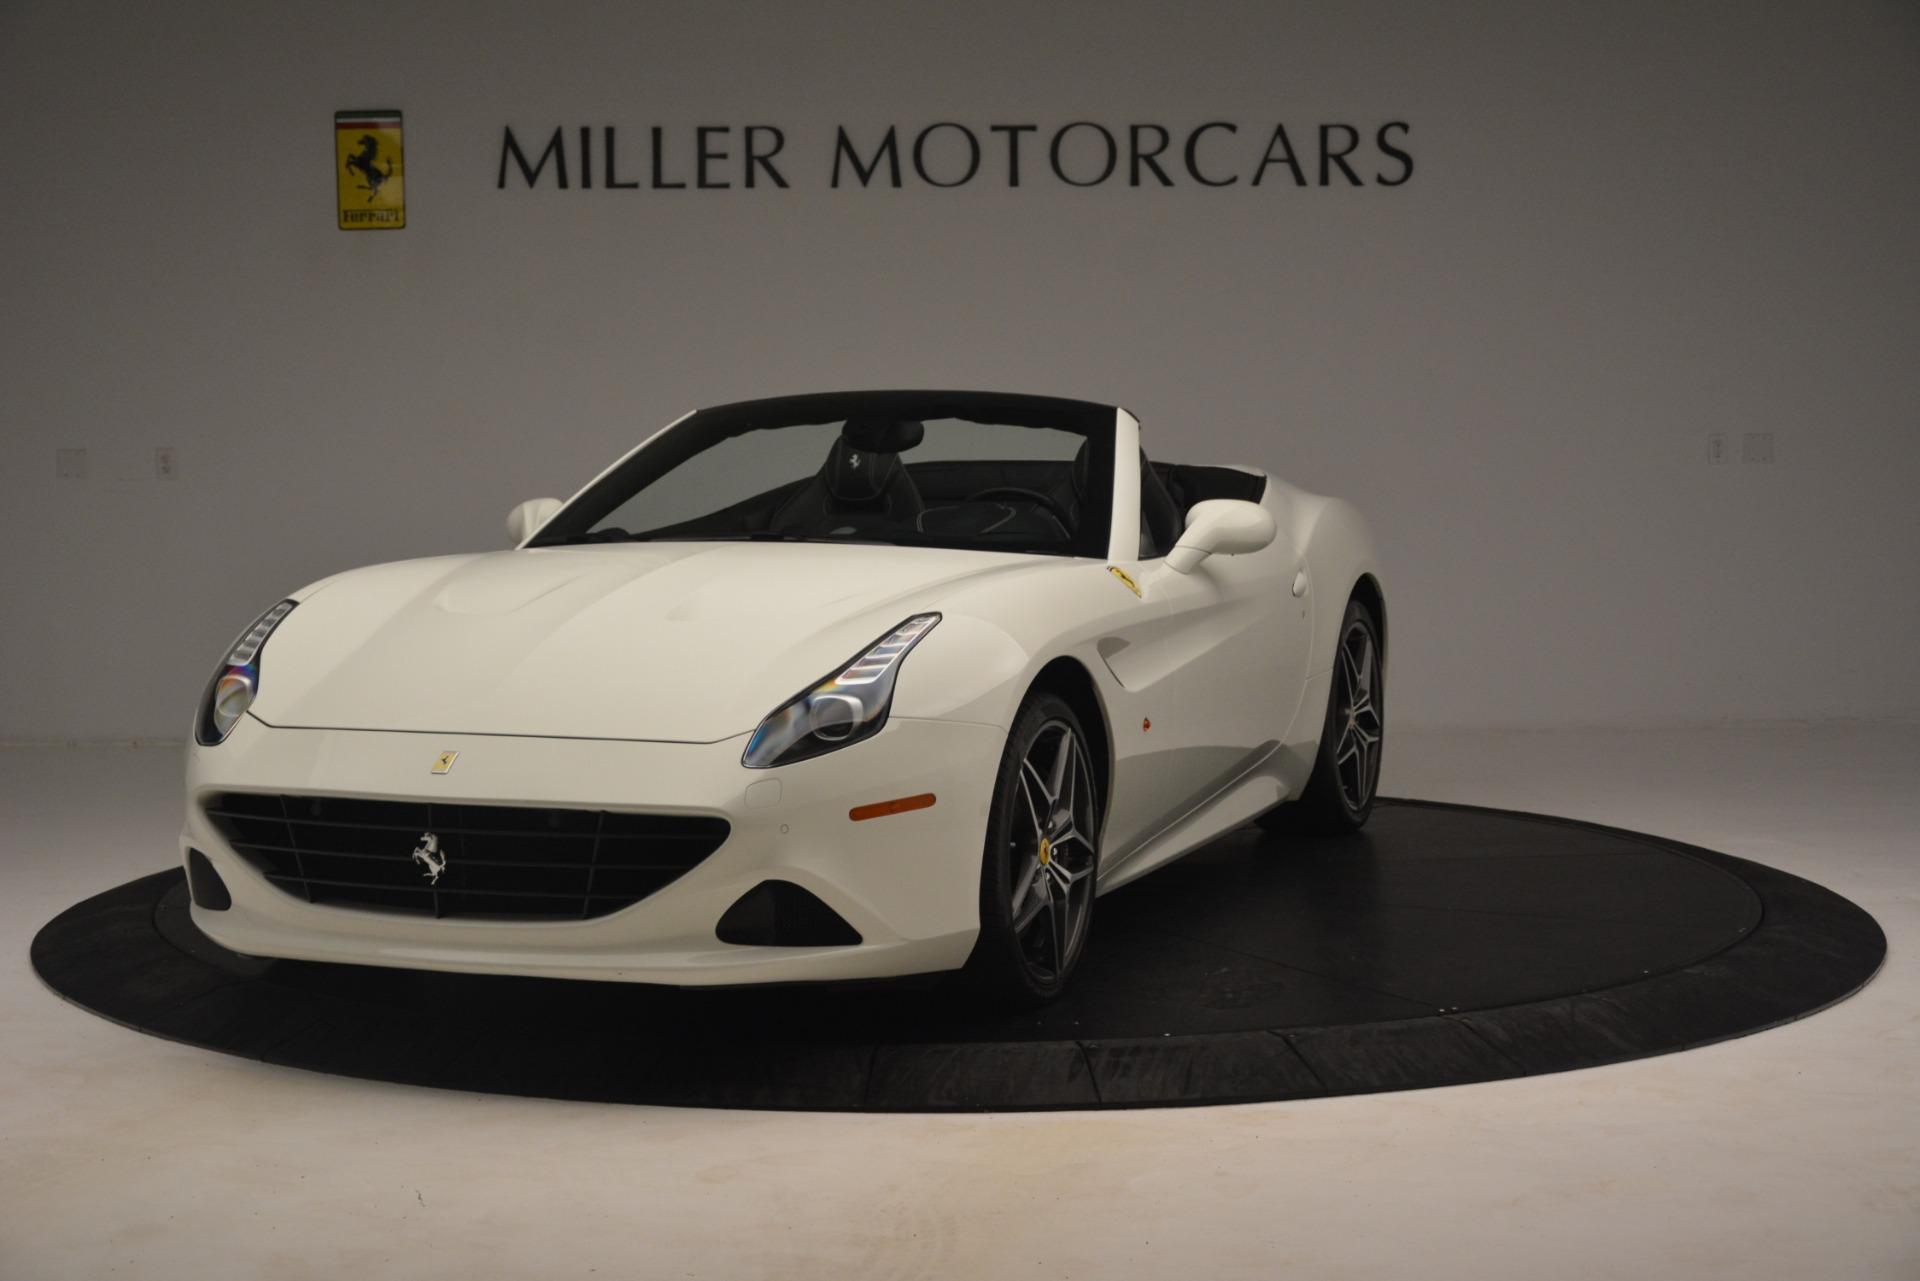 Used 2016 Ferrari California T for sale Sold at Maserati of Greenwich in Greenwich CT 06830 1